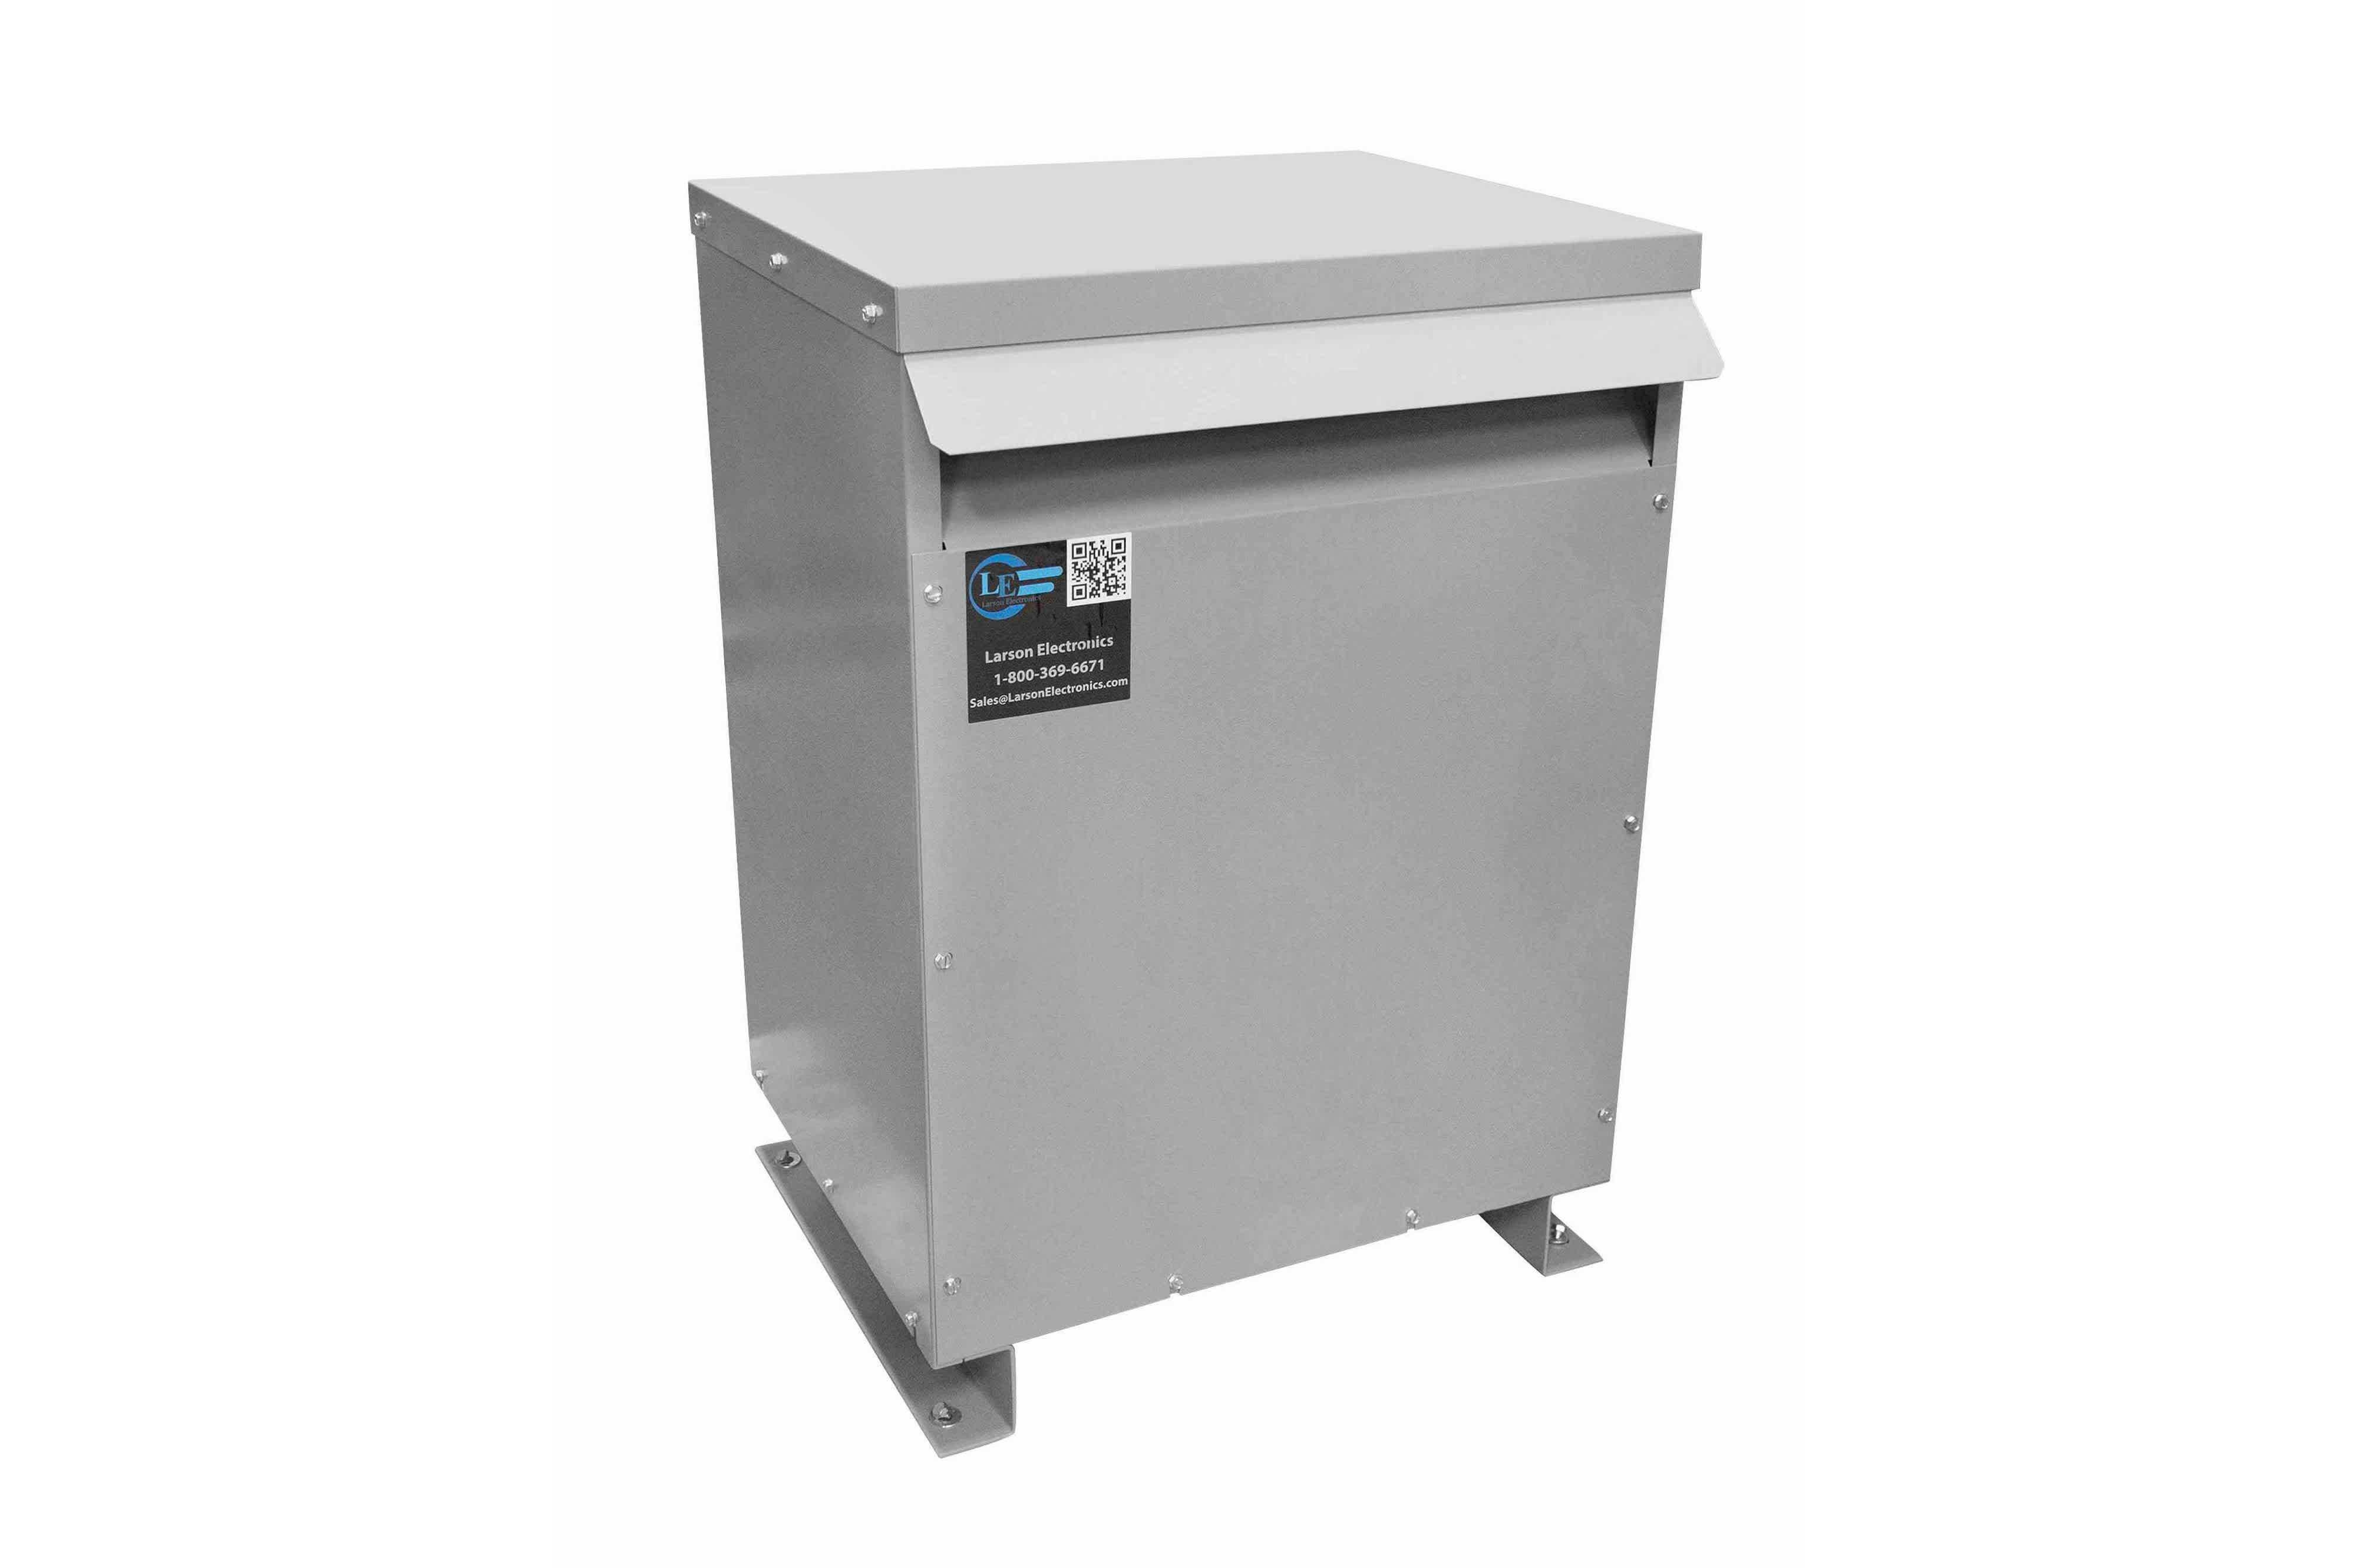 12 kVA 3PH DOE Transformer, 230V Delta Primary, 208Y/120 Wye-N Secondary, N3R, Ventilated, 60 Hz